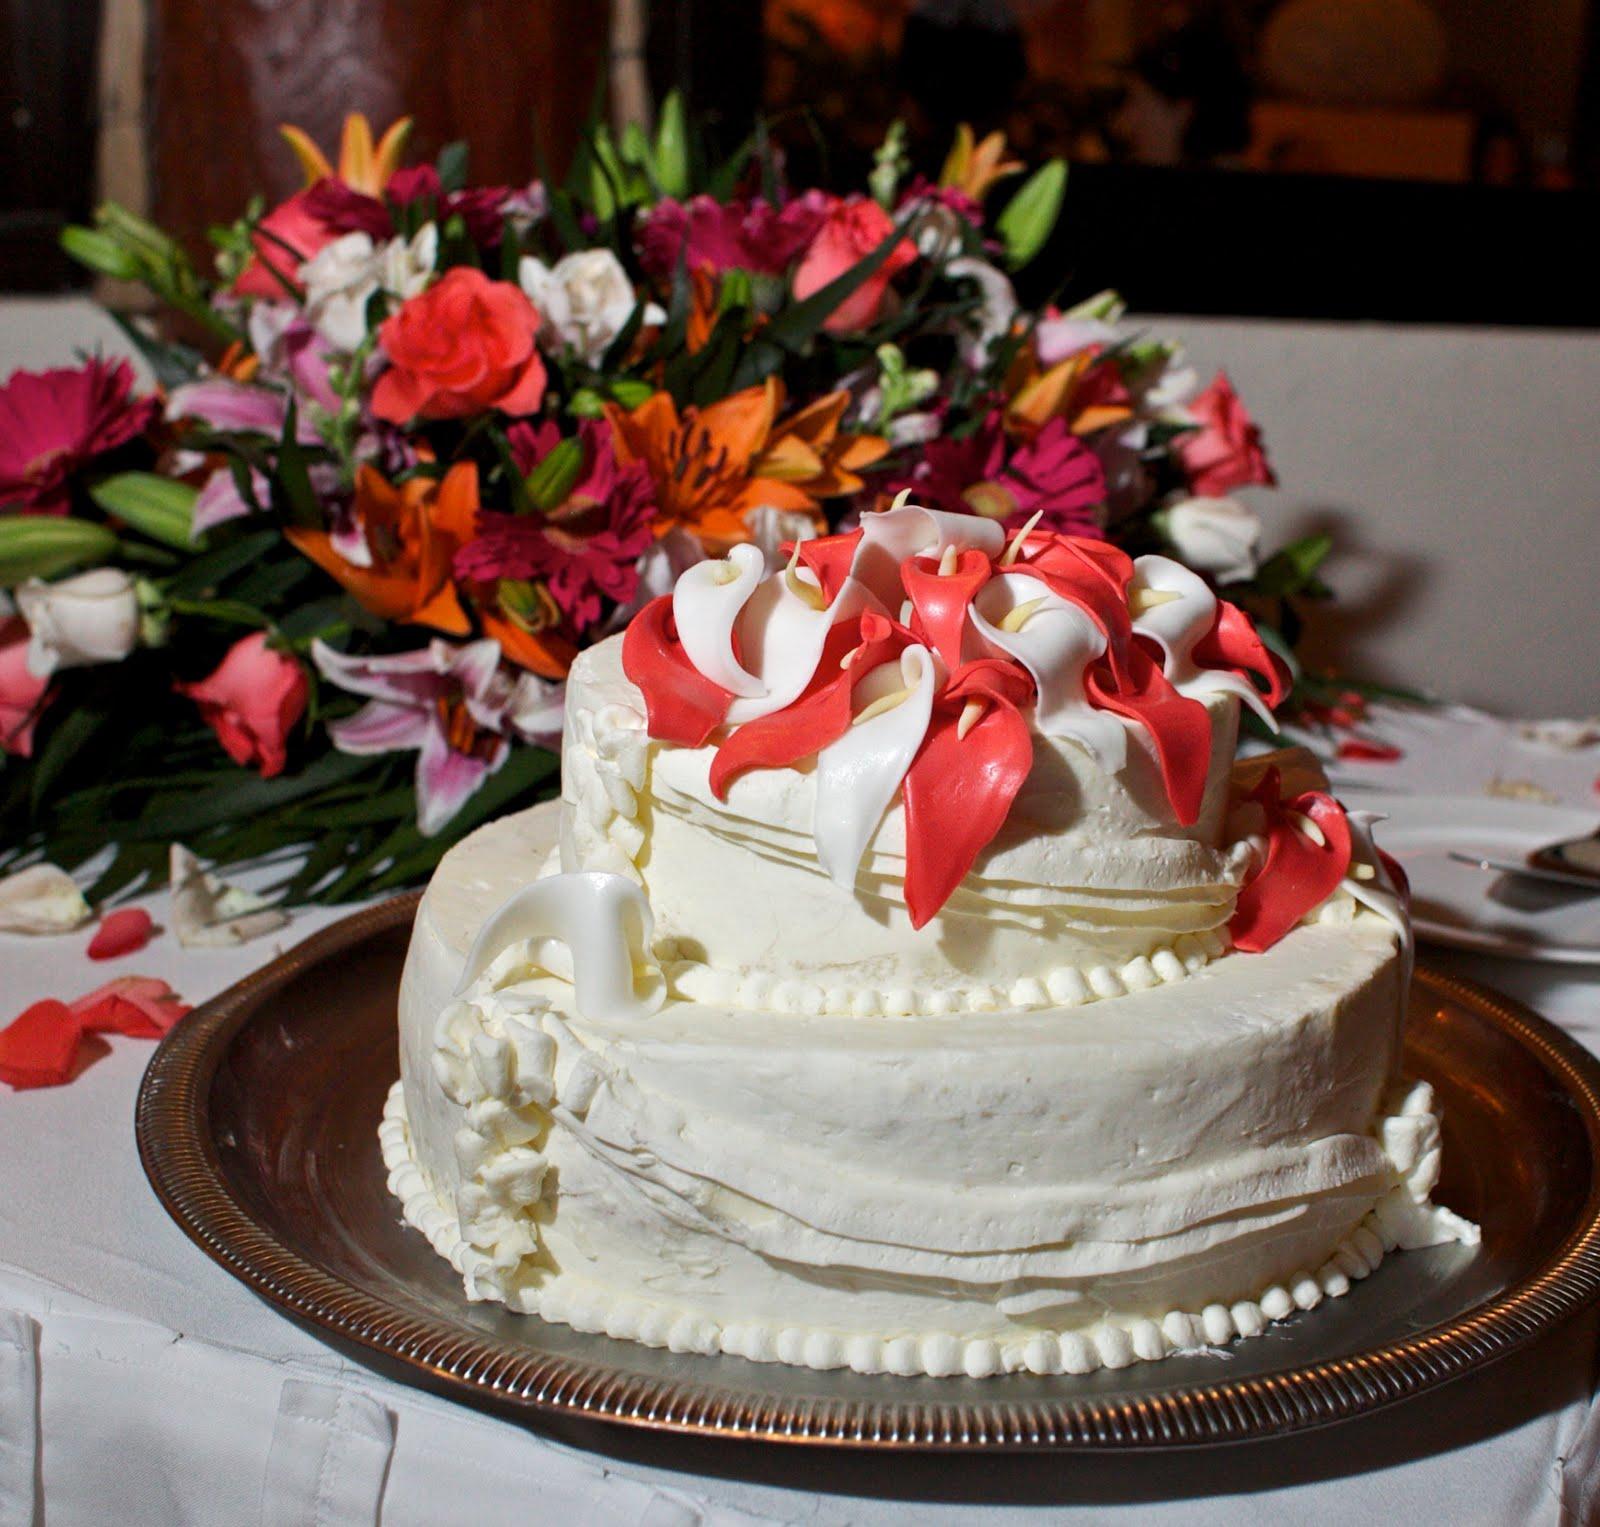 Cake Wrecks - Home - Picture Perfect